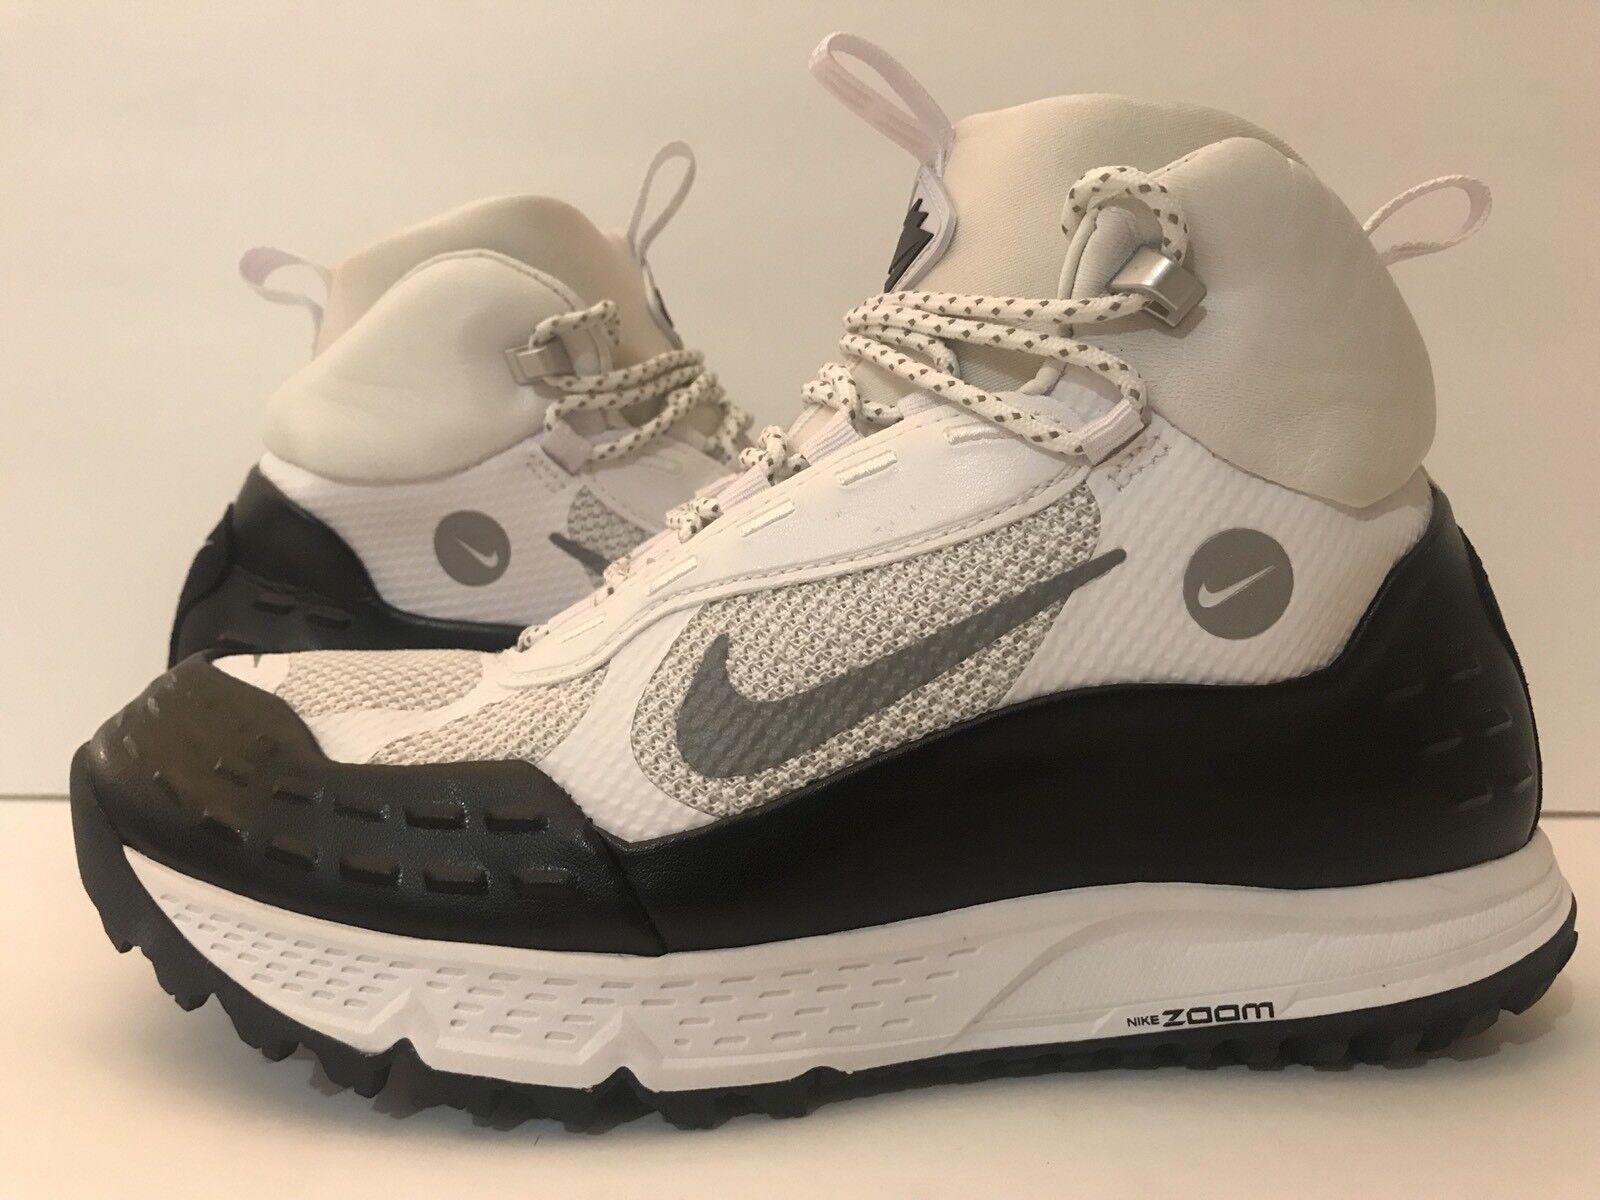 promo code 9fed4 886ad Nike air zoom 3m sertig 16 nero   bianco 3m   argento   3m bianco  904335-100 sz 9